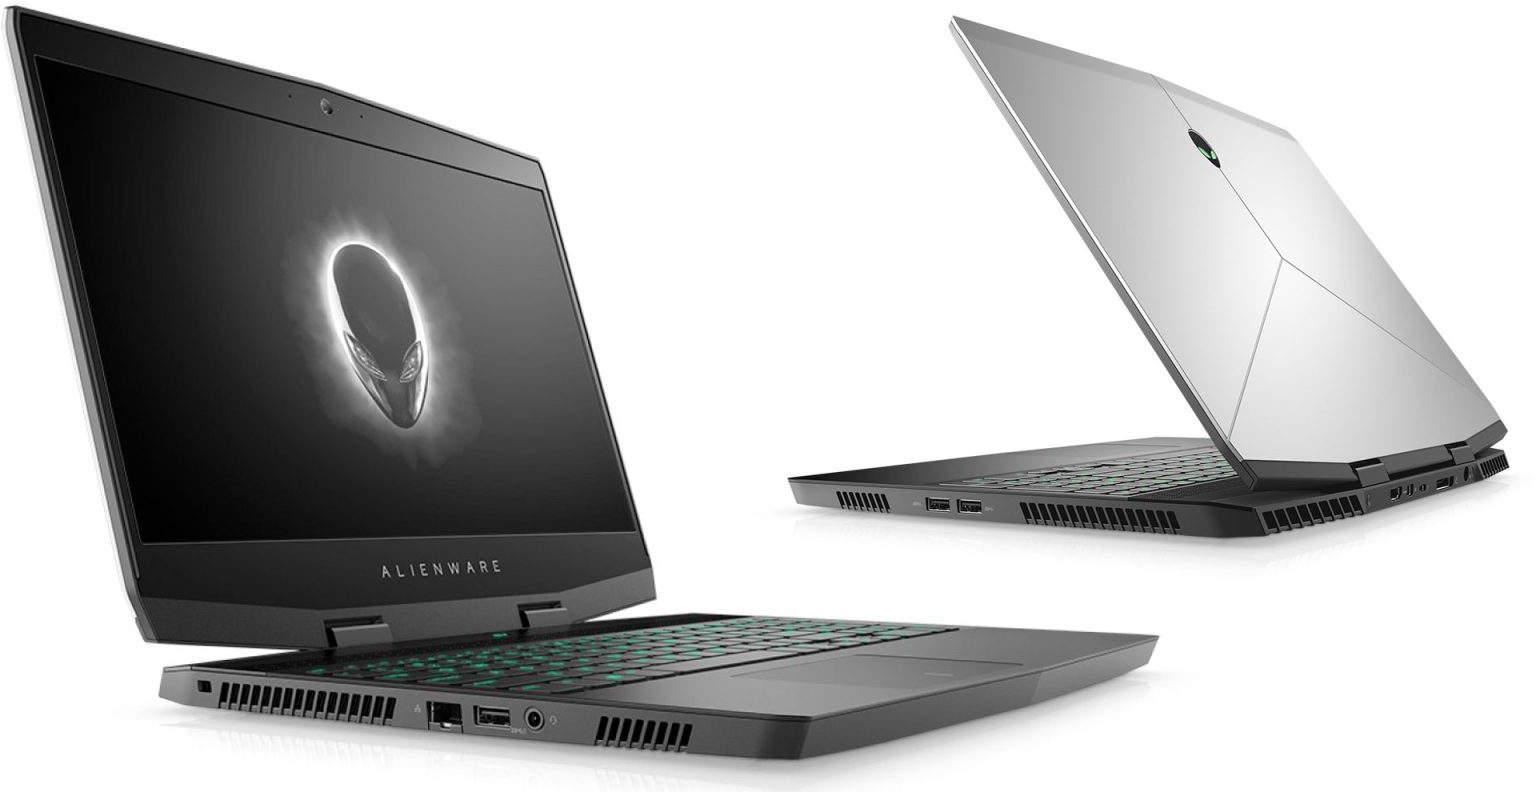 Купить Ноутбук Dell Alienware M15 (M15-5577) фото 3